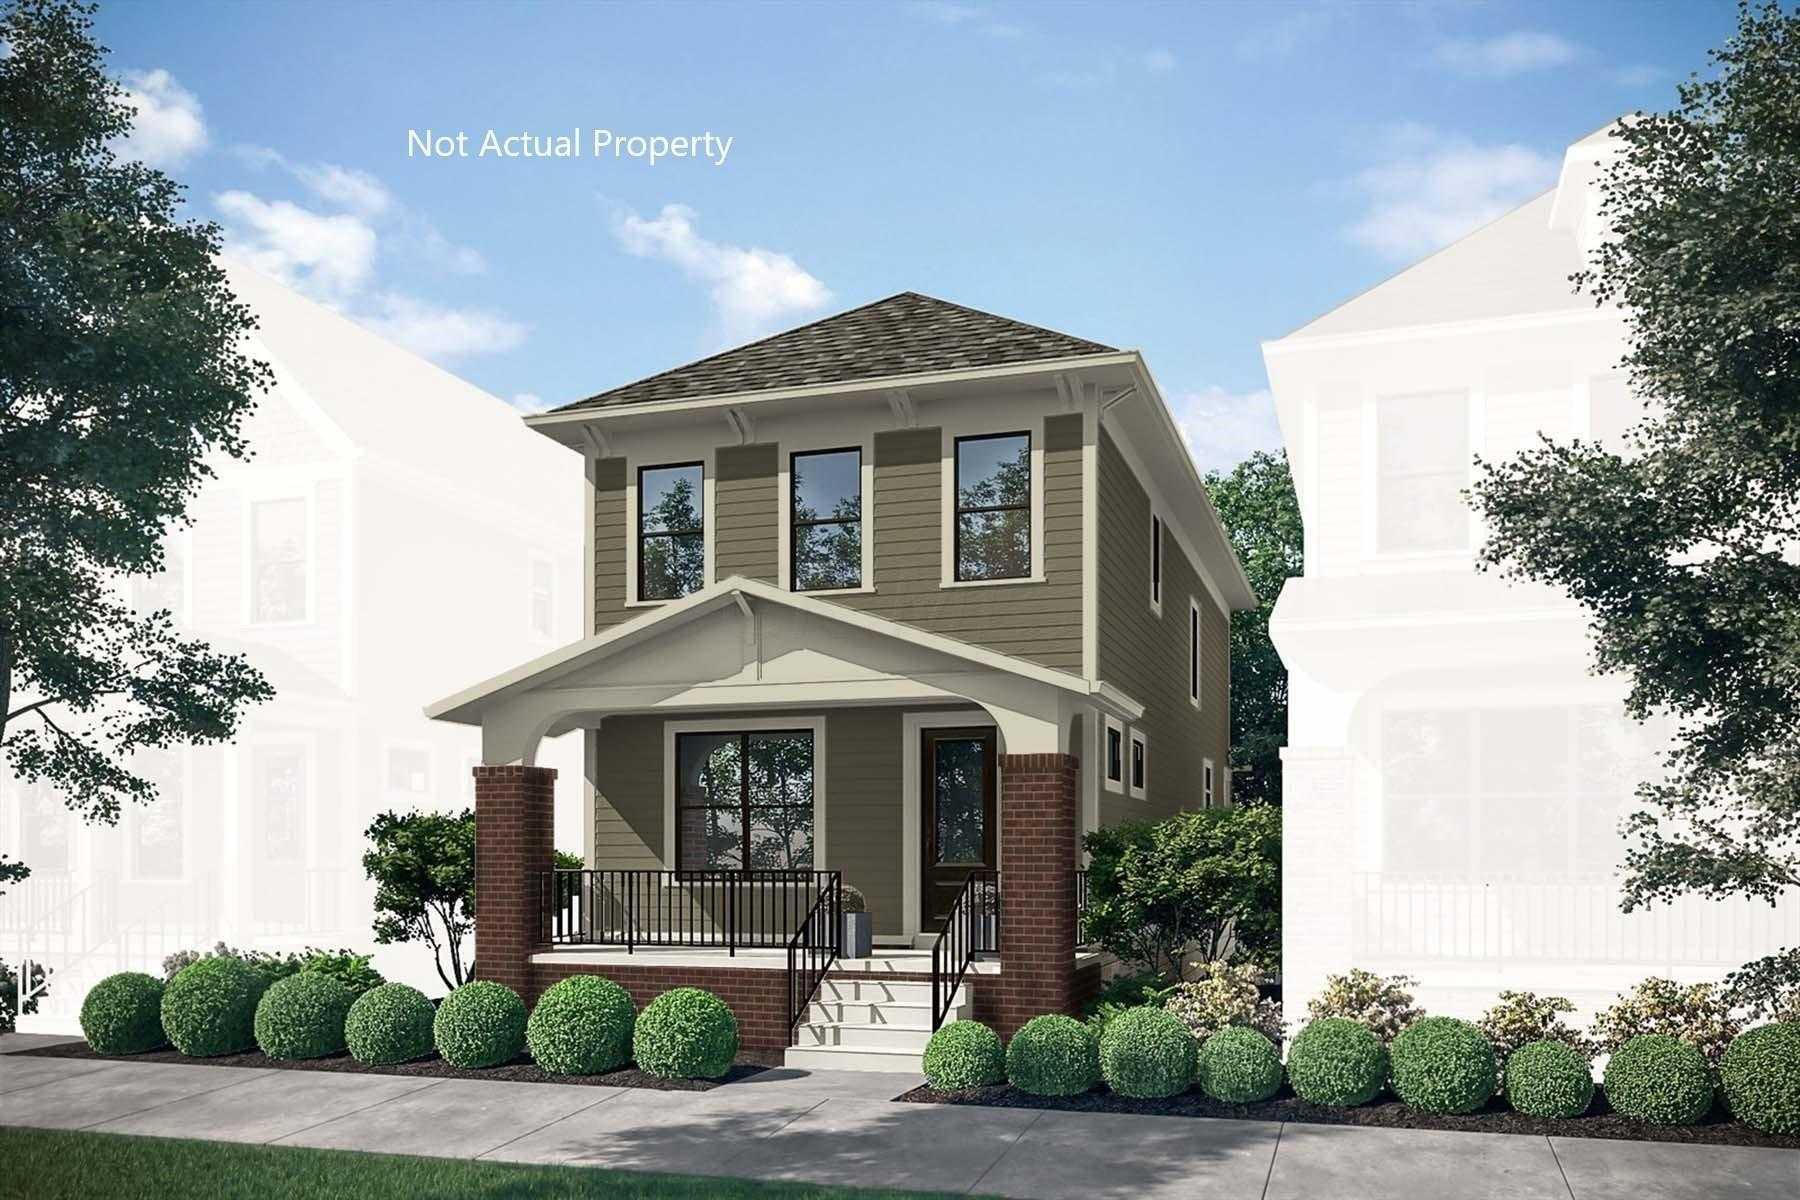 937 W First Avenue Unit Lot 64 Grandview,OH 43212 219023345